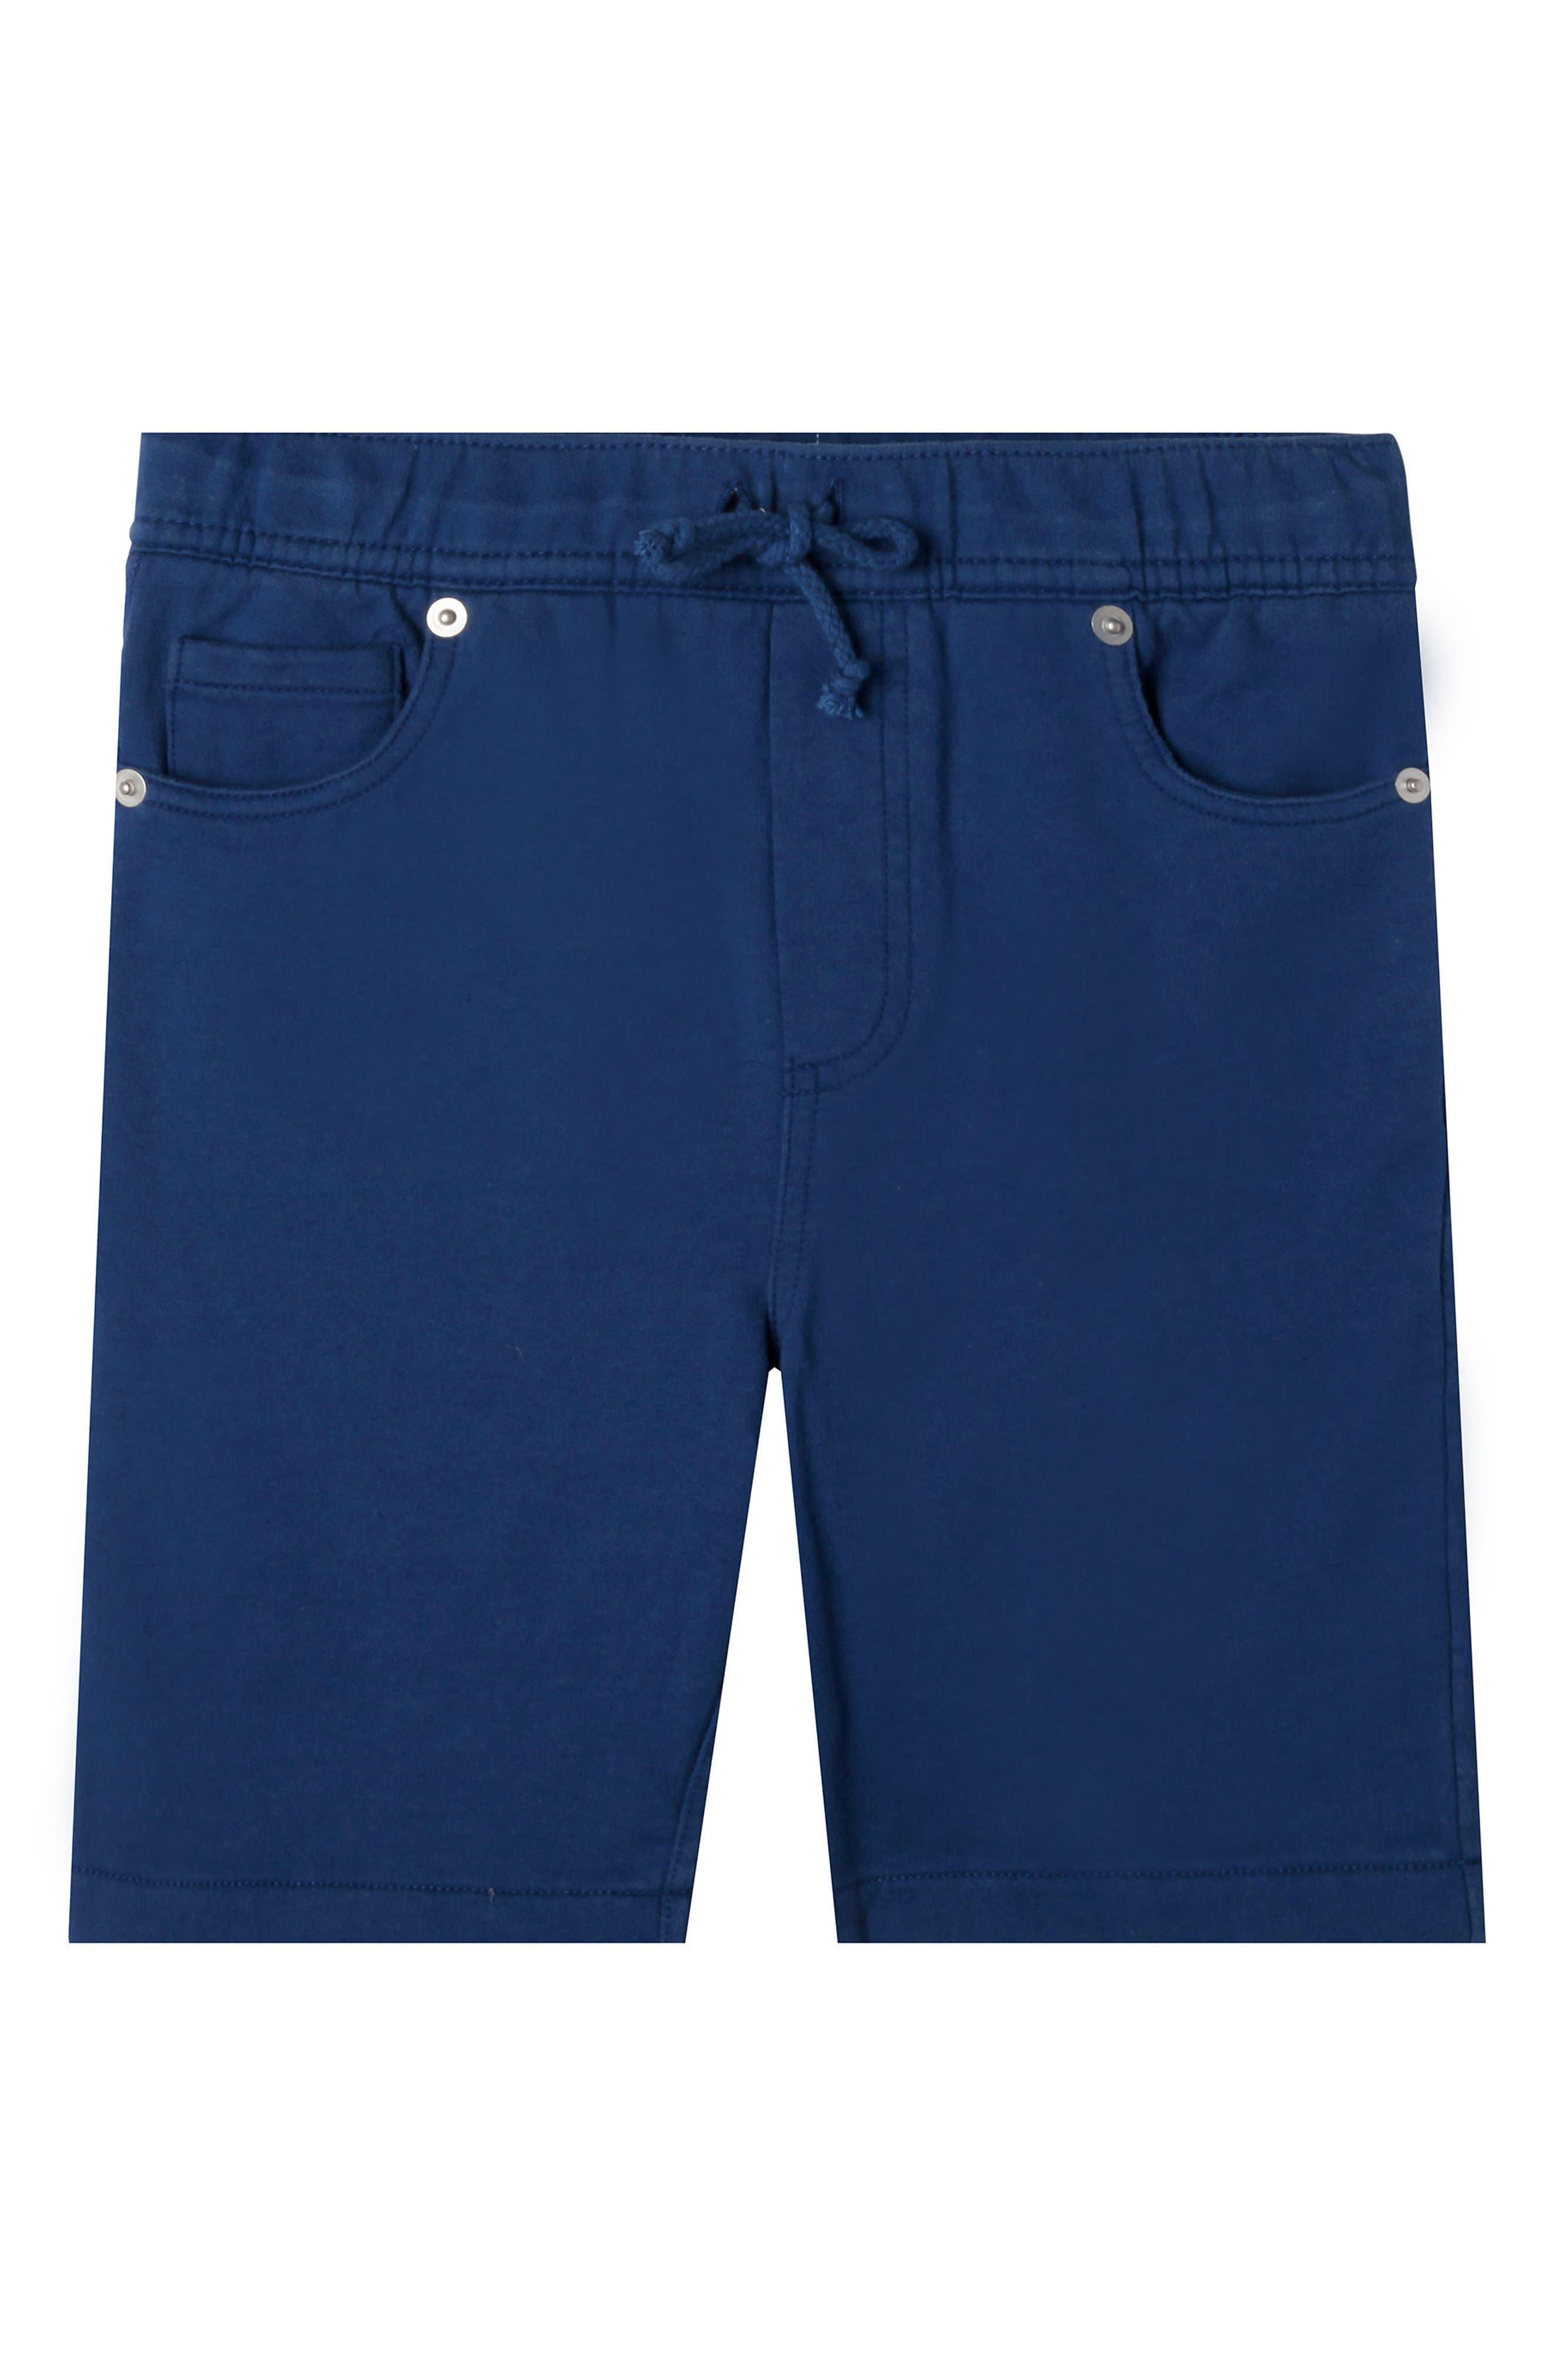 Anthony Drawstring Jeans Short,                         Main,                         color, Ocean Blue